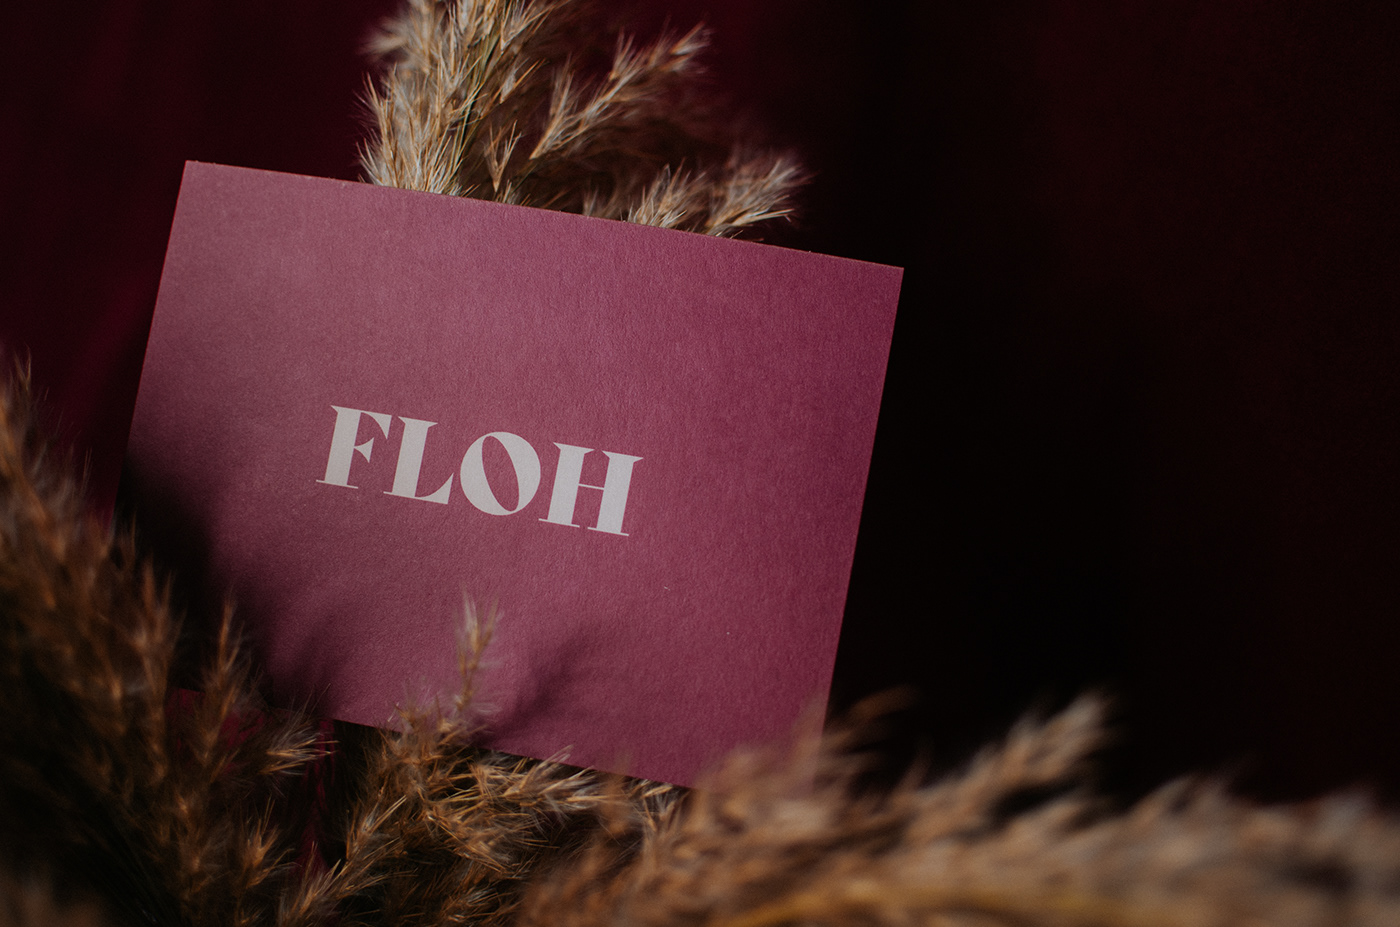 Floh greeting card